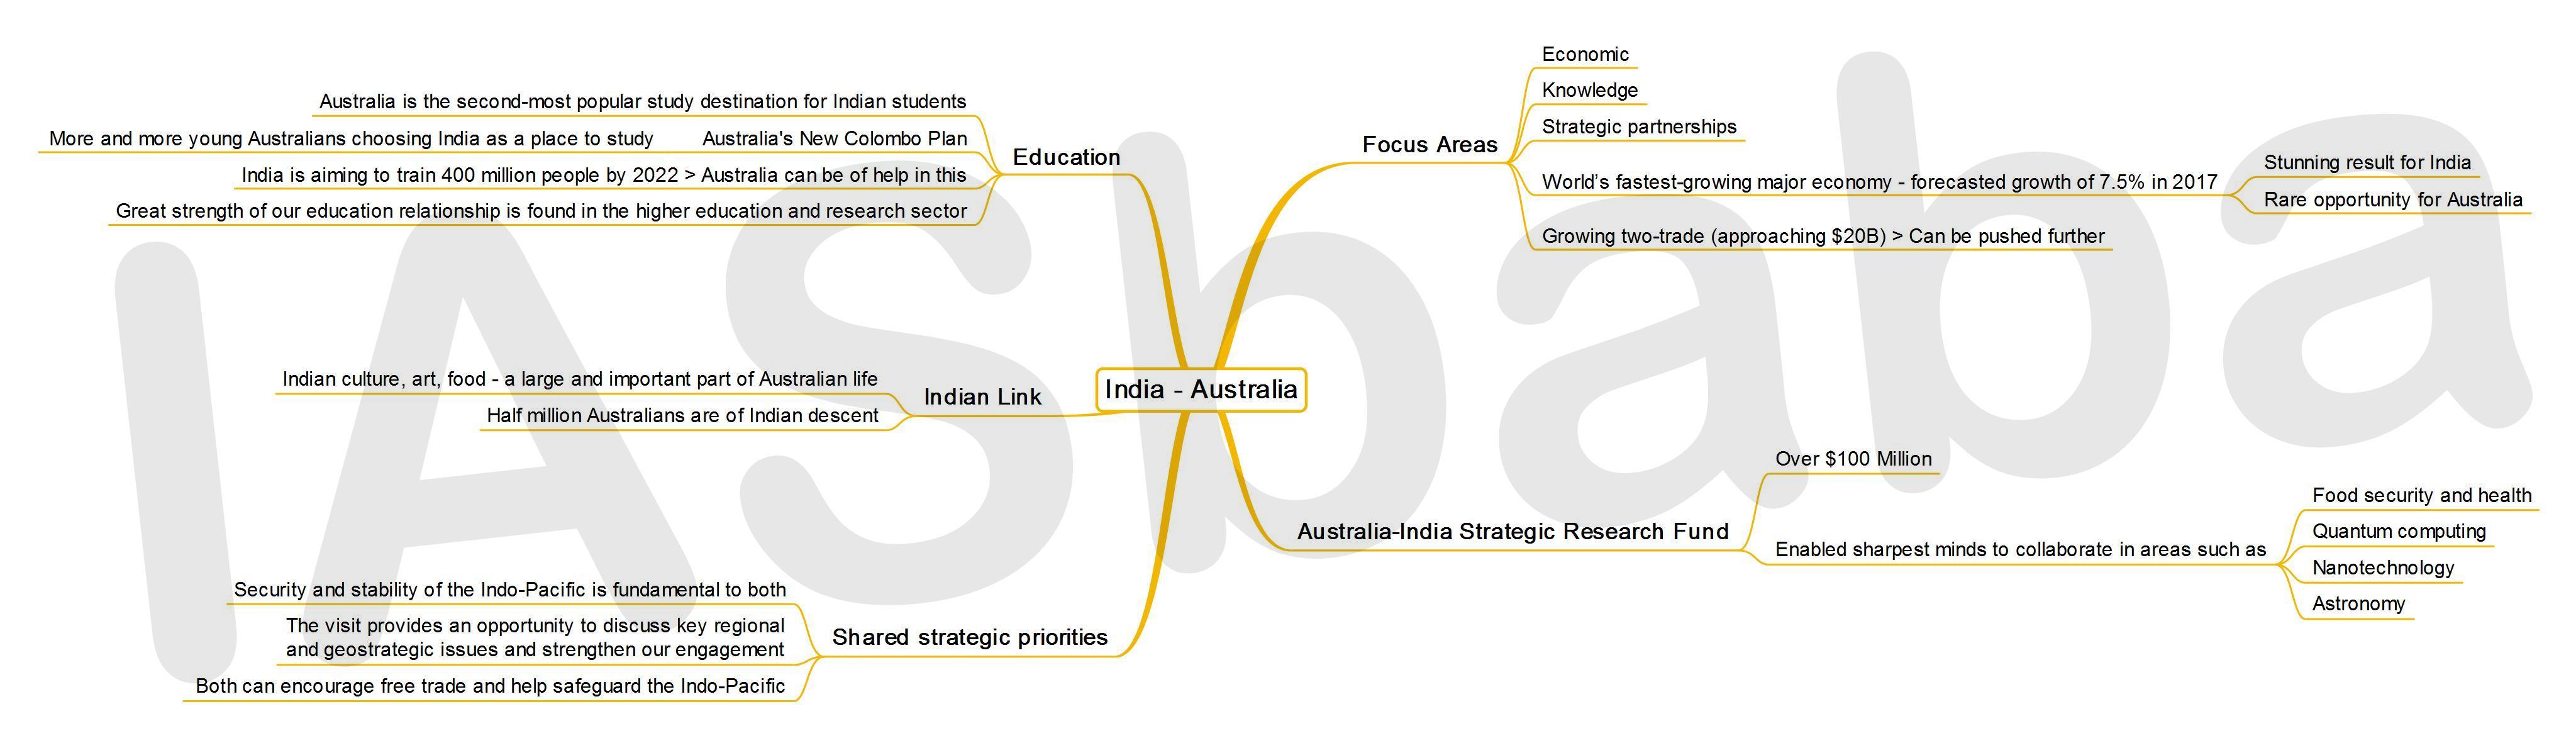 IASbaba's MINDMAP : Issue - India - Australia